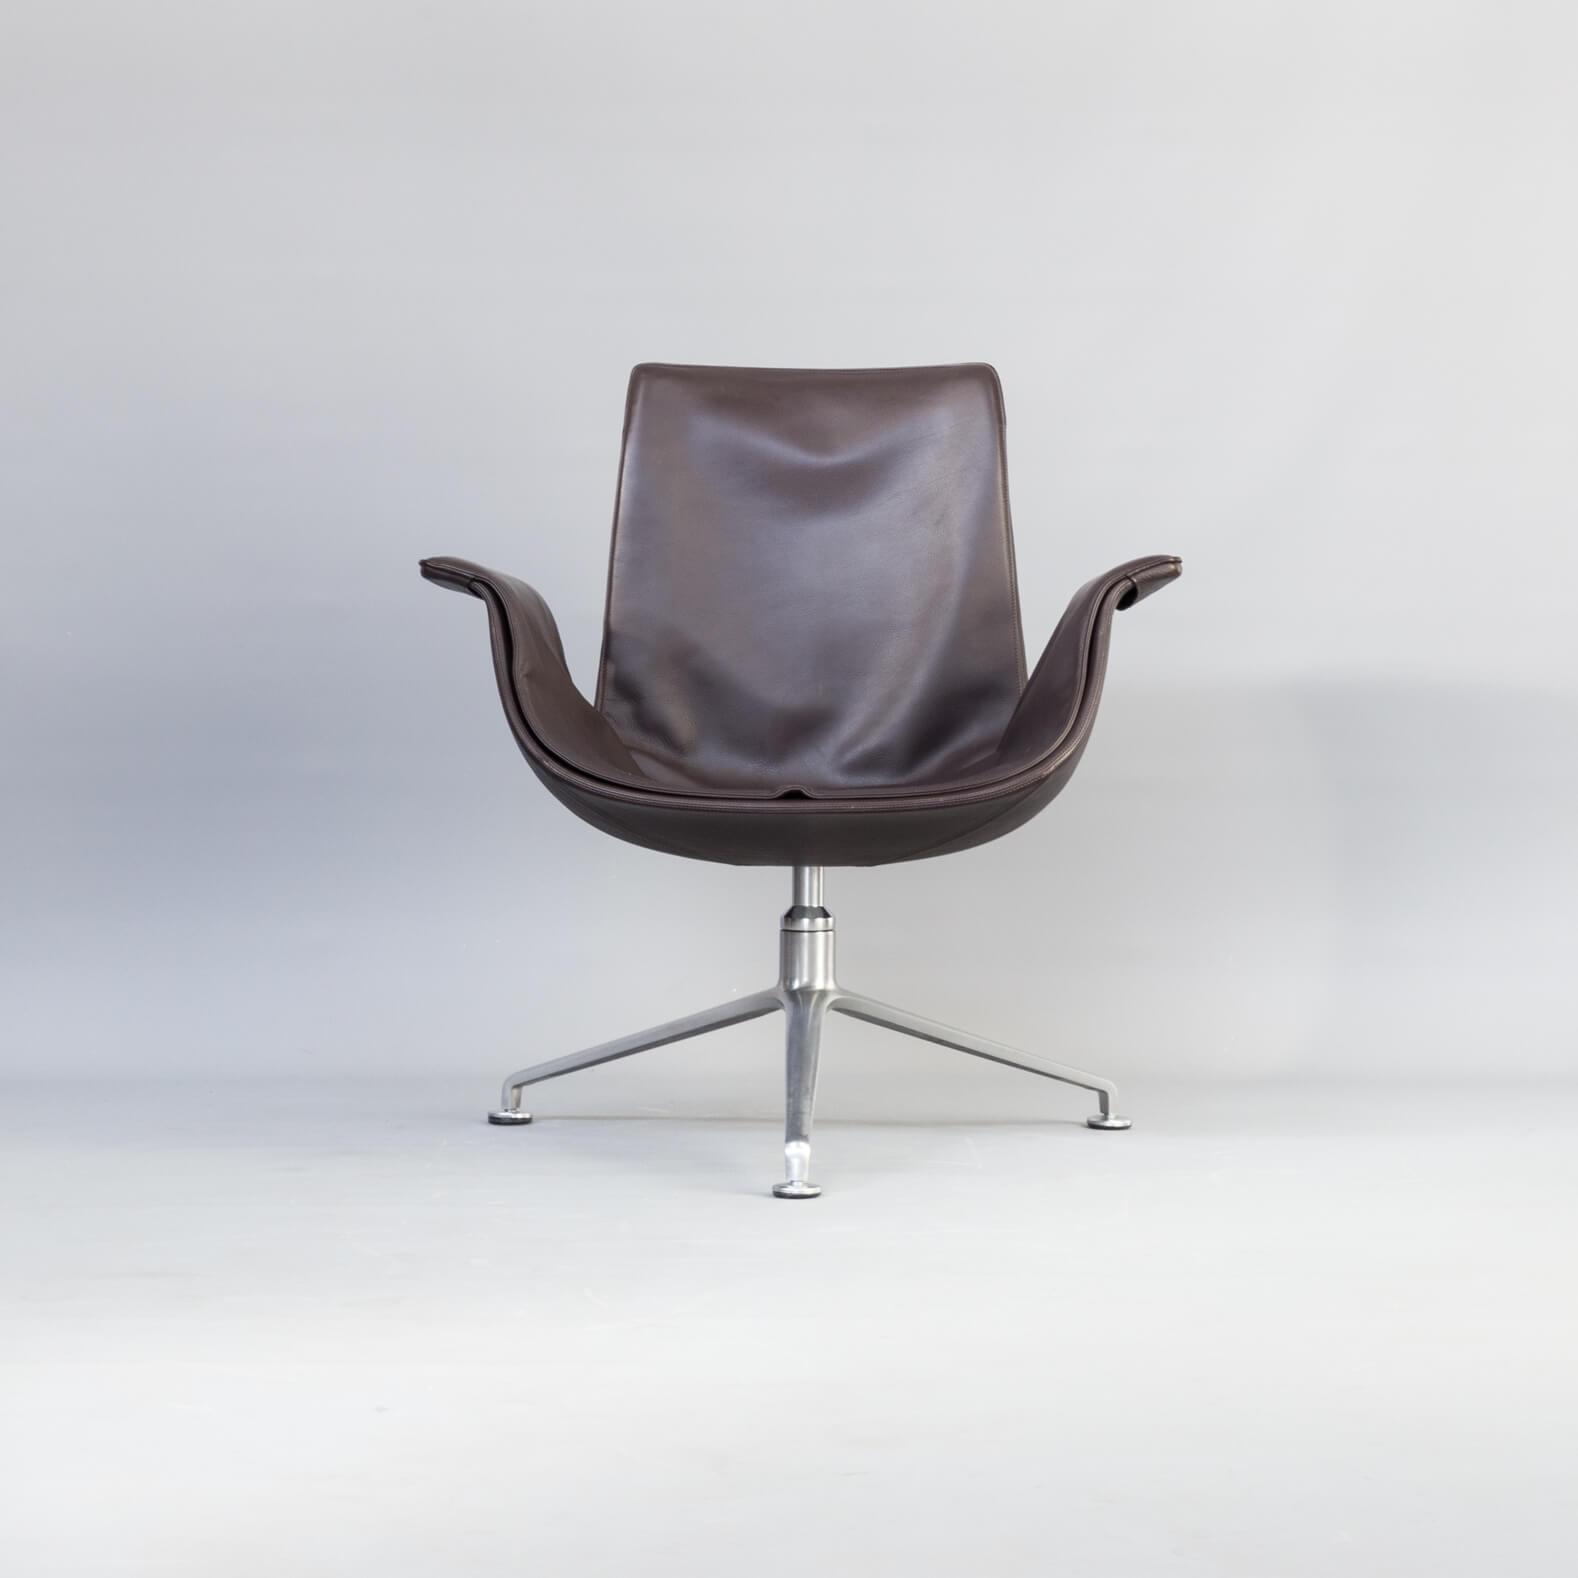 50 S Jorgen Kastholm Preben Fabricius 6727 Tulip Lounge Chair For Knoll Barbmama